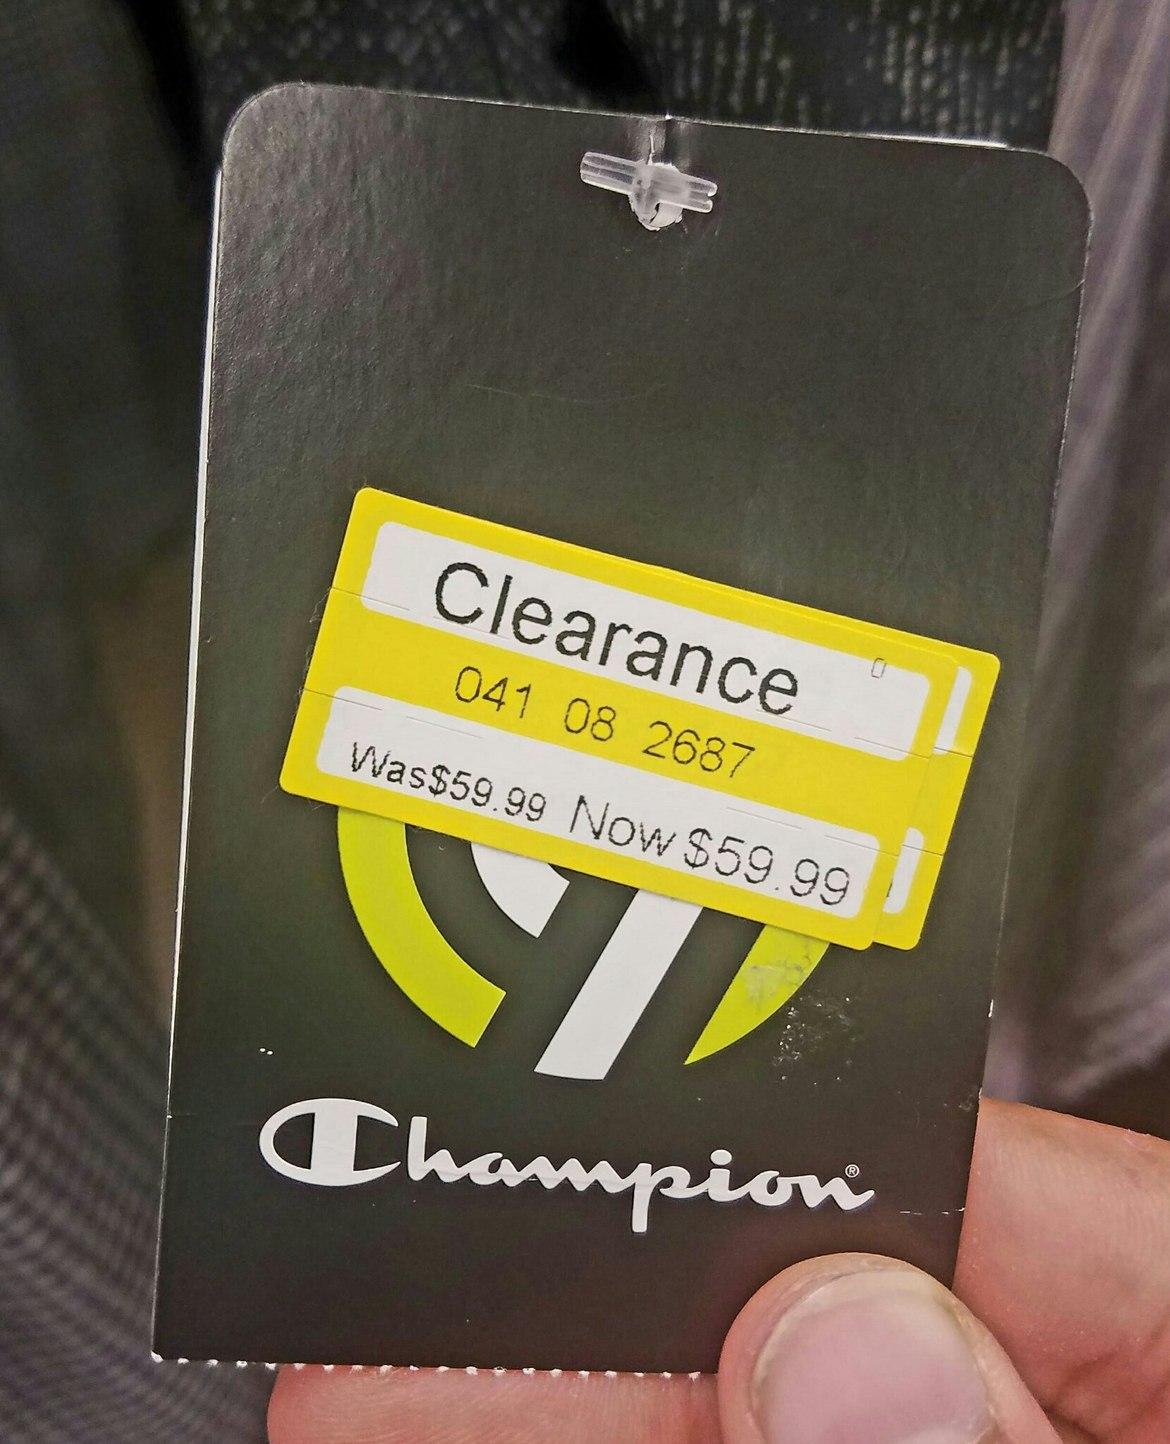 Wow Target, what a deal! - meme